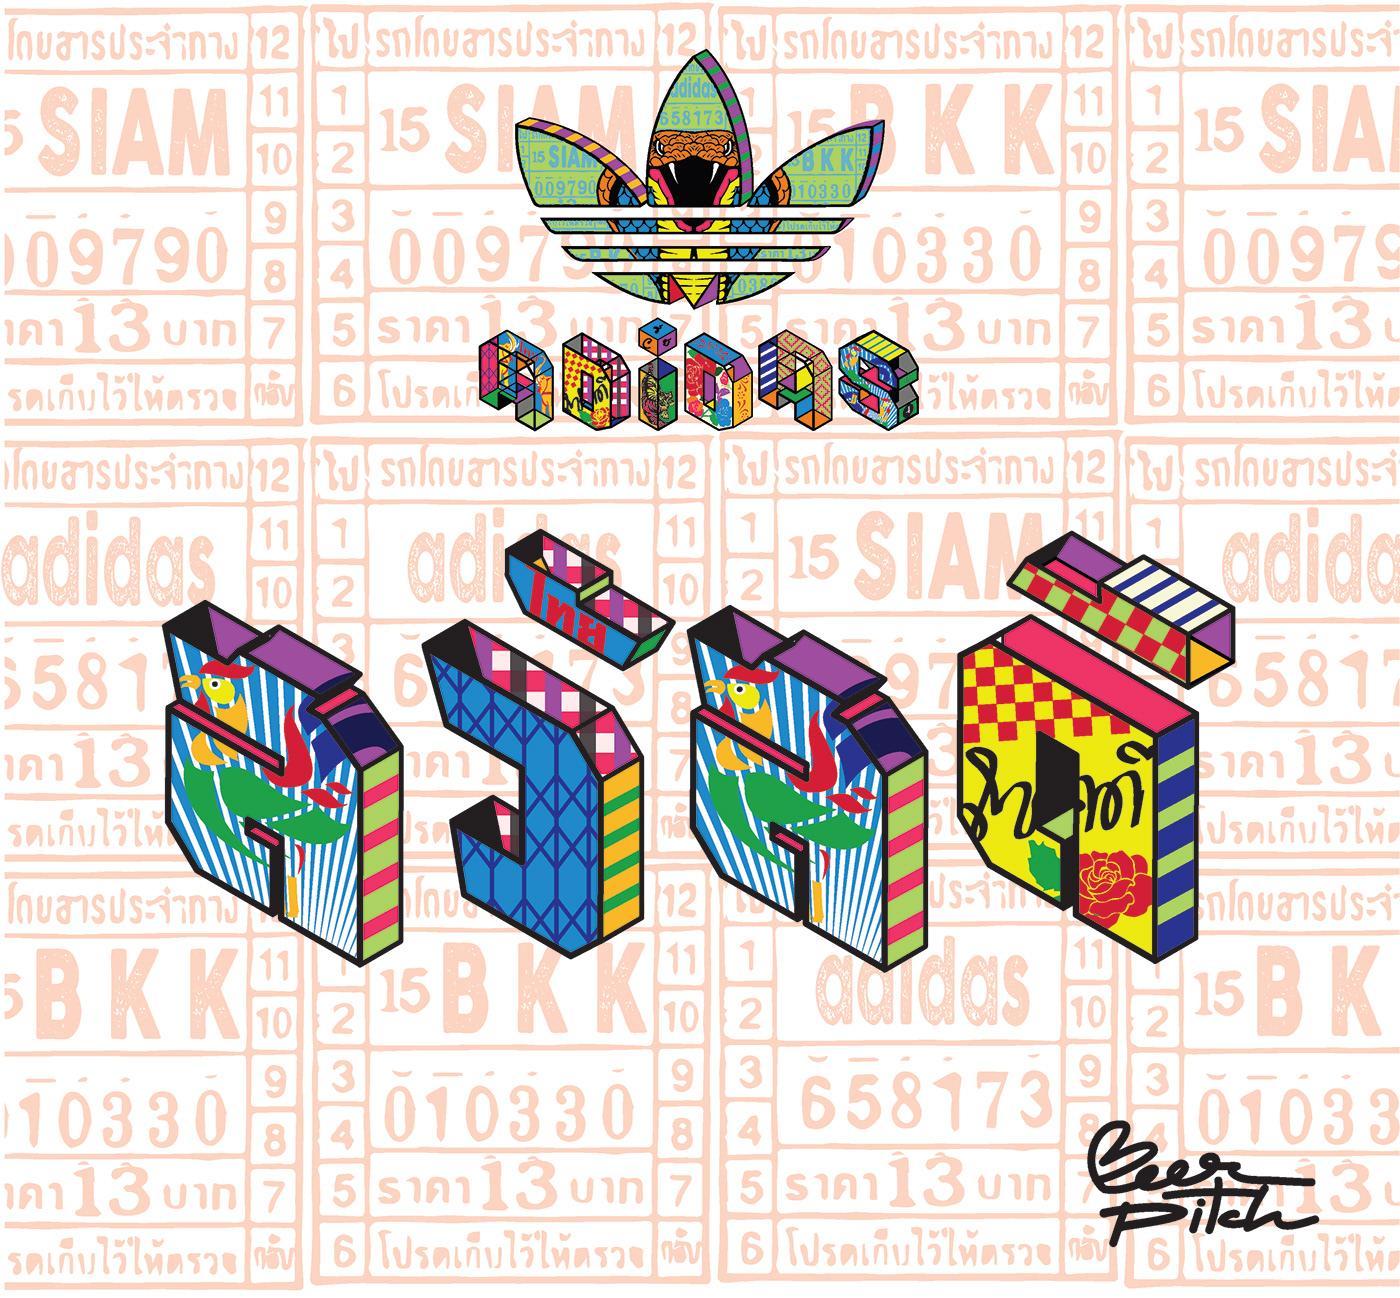 adidas,adidasoriginal,adidasthailand,adidastrefoil,adidasxbeerpitch,beerpitch,thaialphabet,thaistyle,trefoillogo,typography